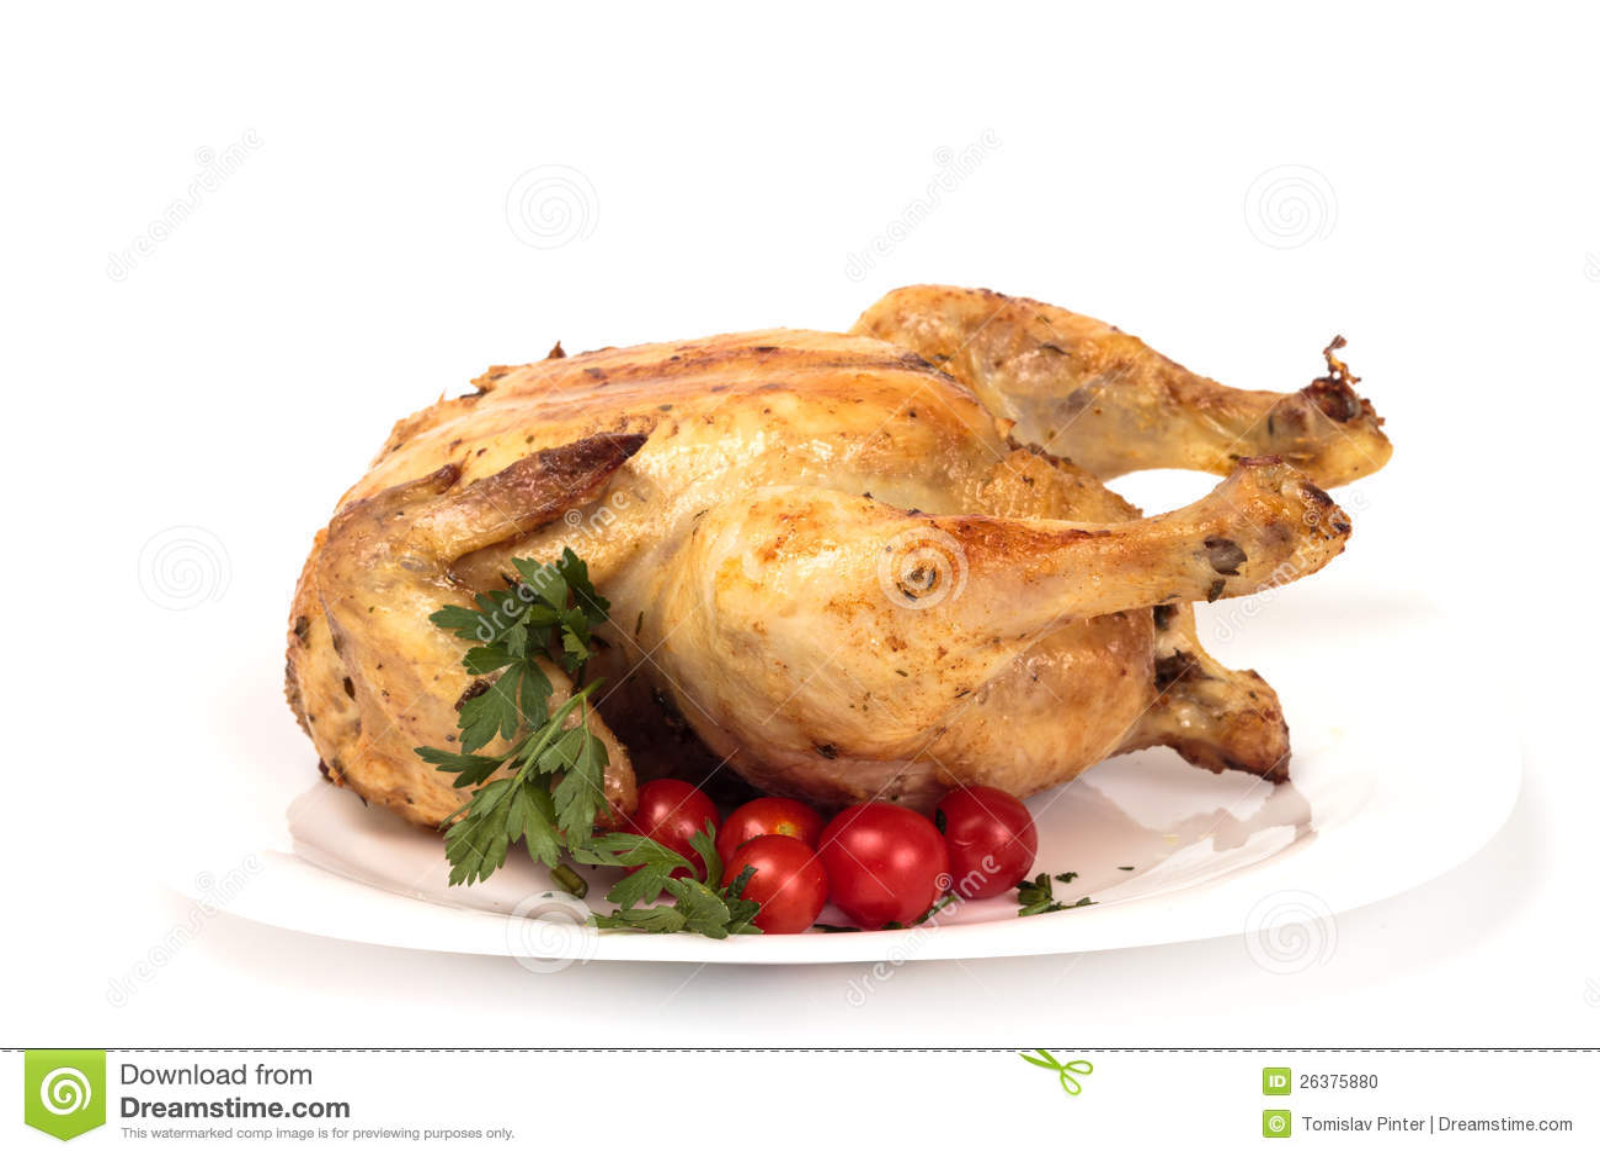 Roast Chicken Stock Photo - Image: 26375880